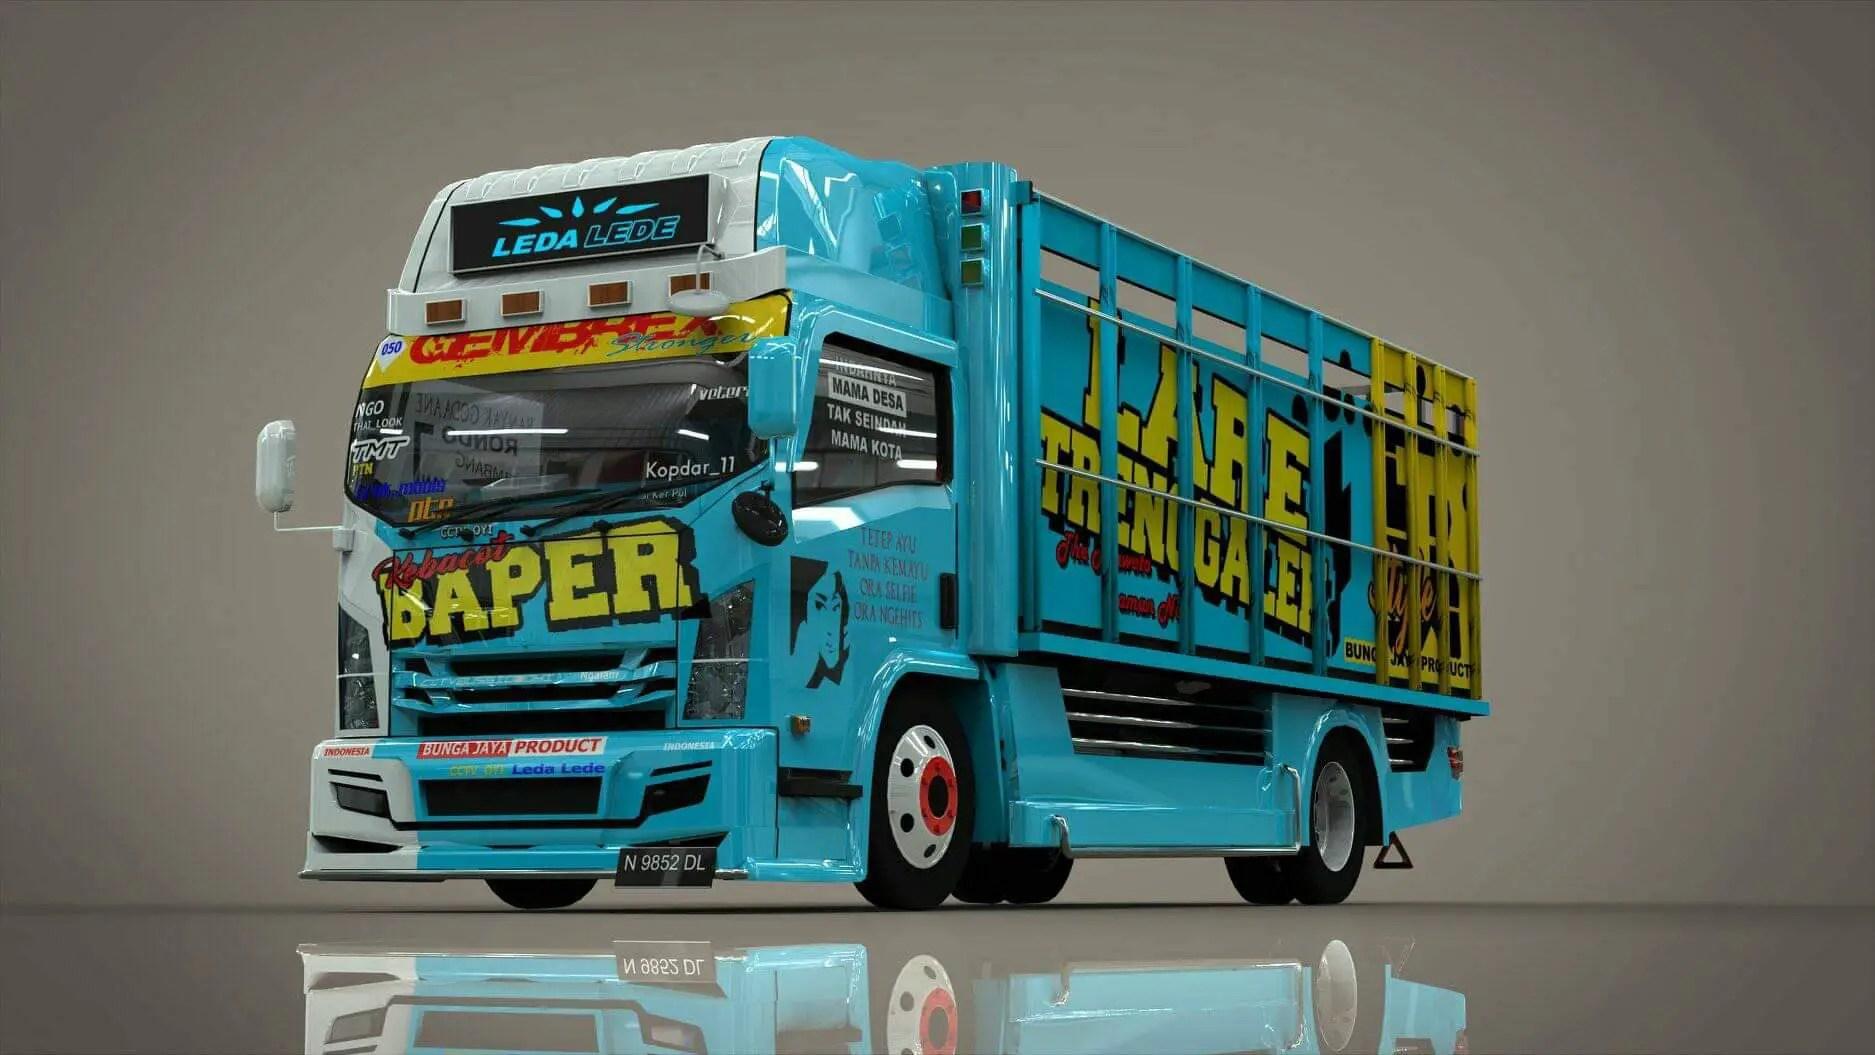 Download ISUZU NMR 71 Mod for Bus Simulator Indonesia, ISUZU NMR 71 Mod for BUSSID, Bus Mod, Bus Simulator Indonesia Mod, BUSSID mod, Car Mod, Gaming News, Gaming Update, ISUZU NMR 71 Mod for BUSSID, Mod, SGCArena, Truck Mod for BUSSID